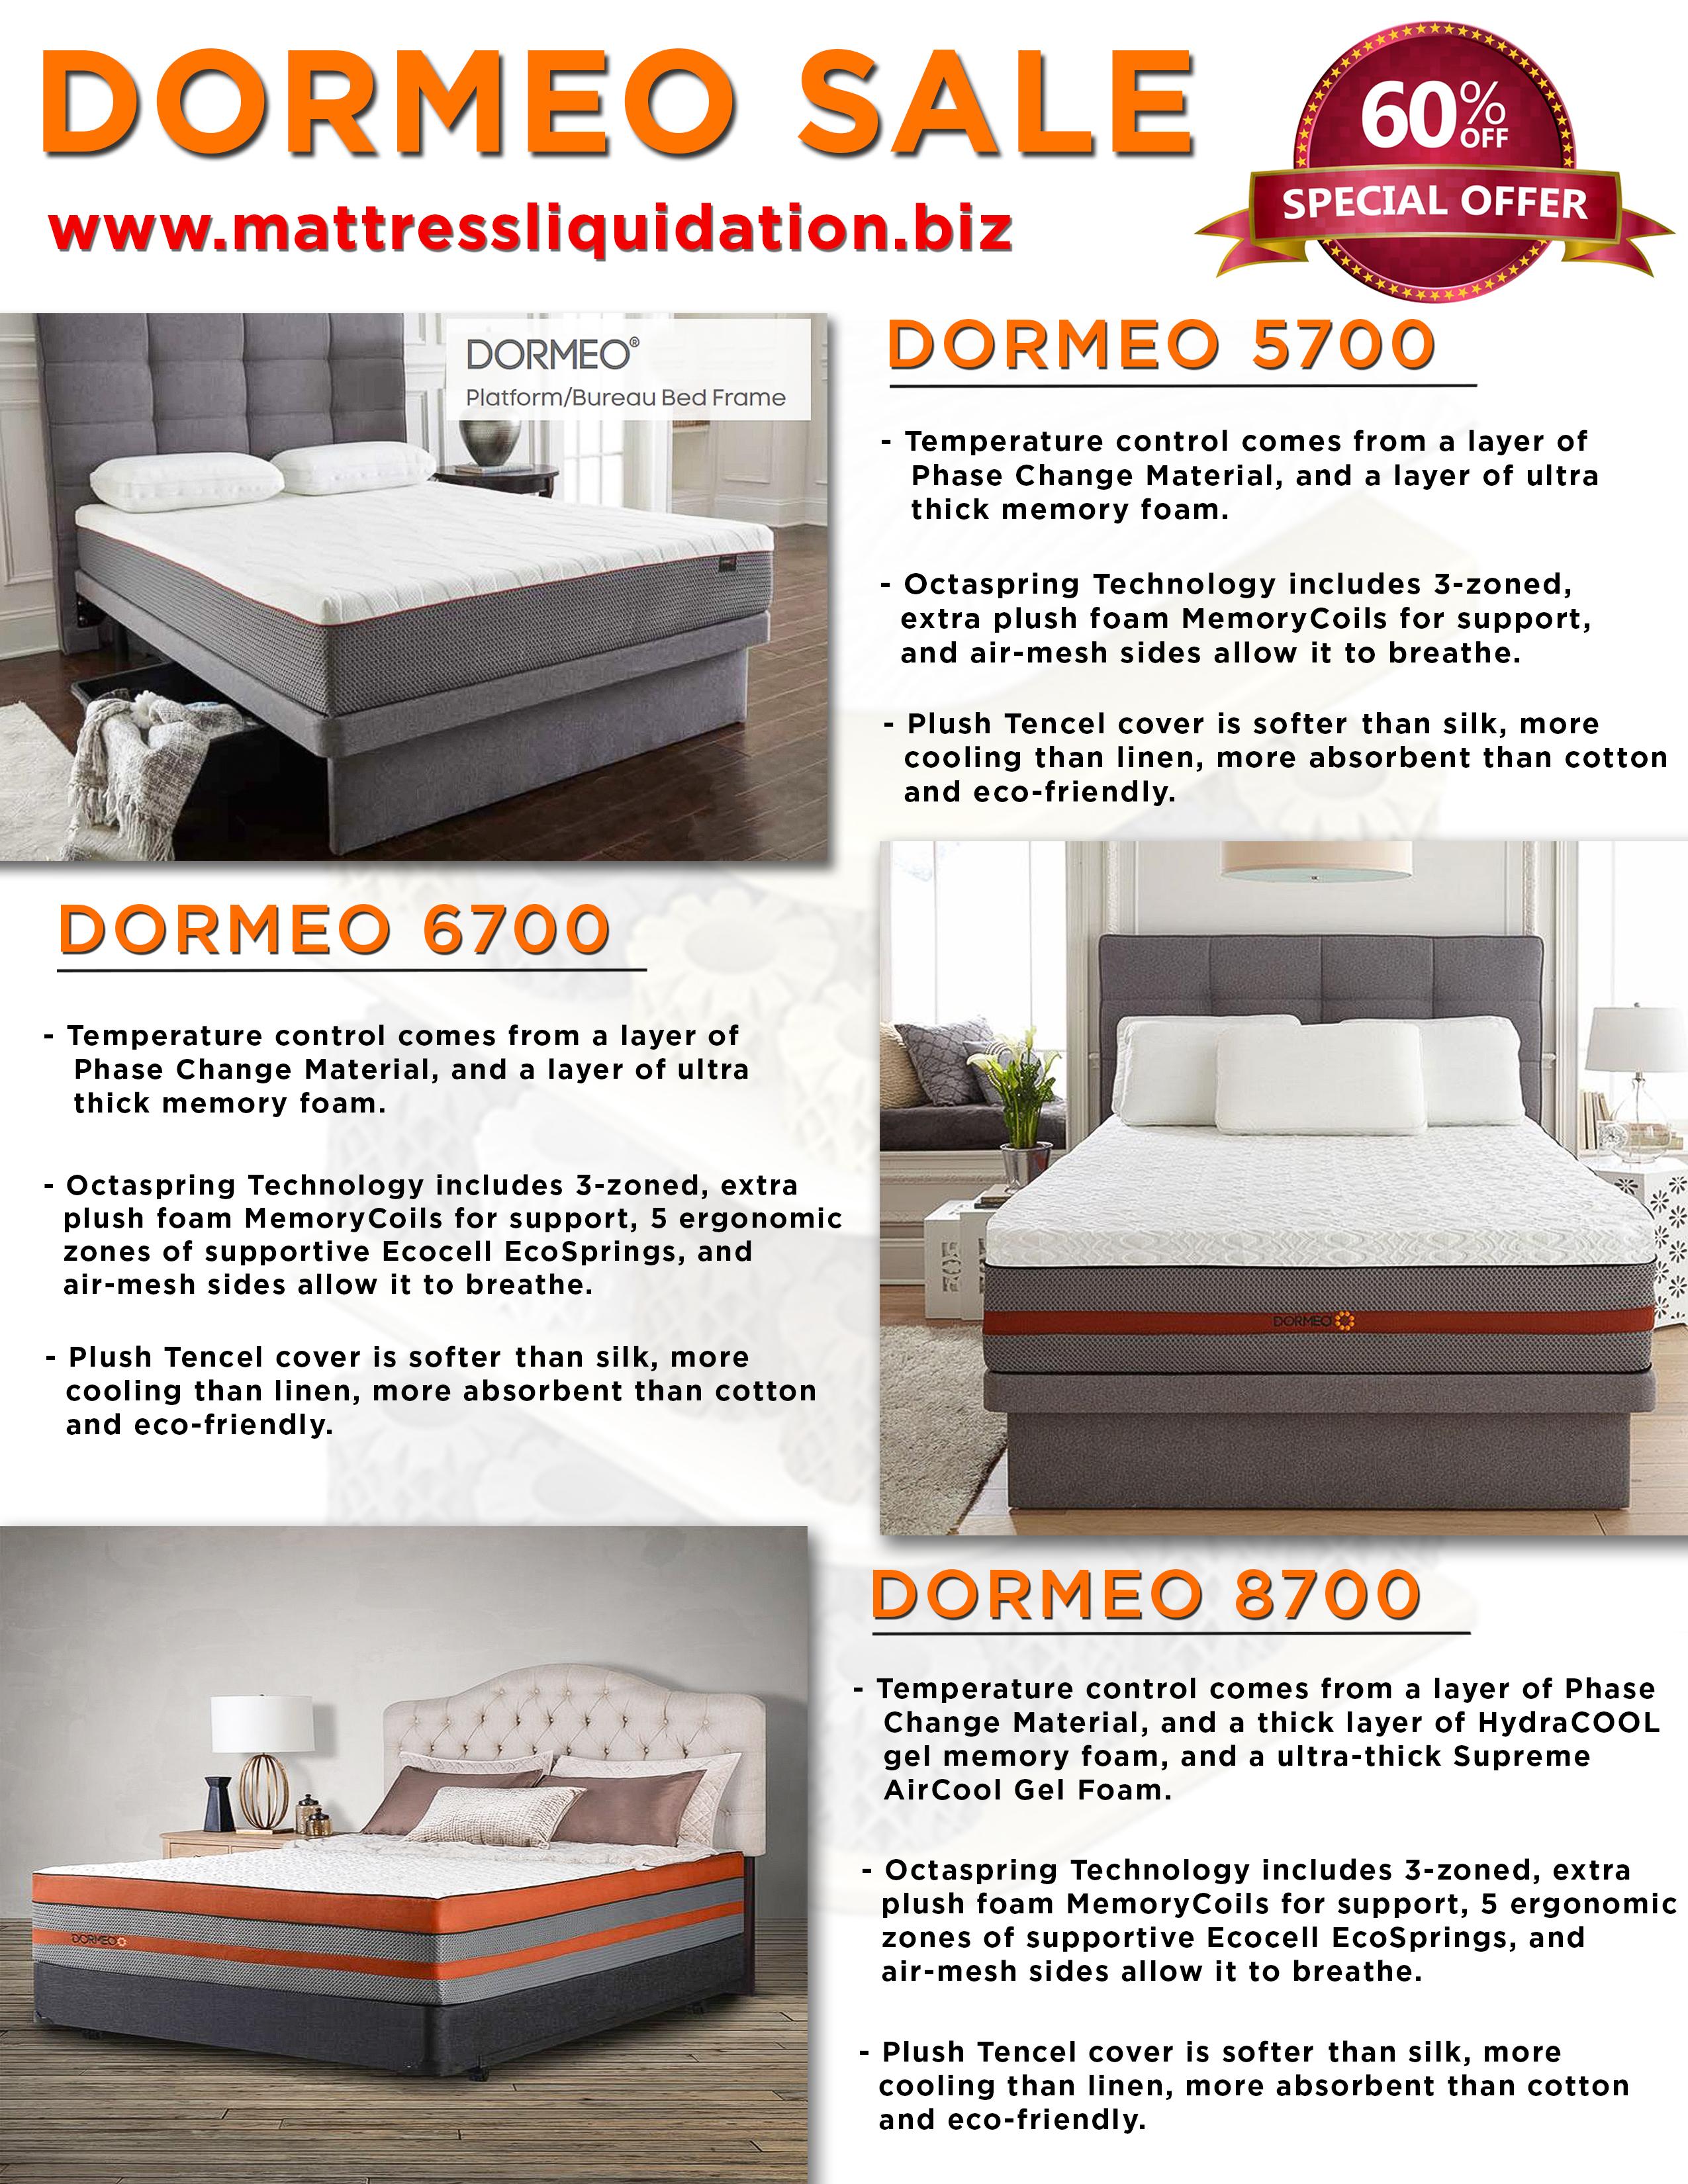 dormeo octaspring memory foam mattresses at mattress liquidation in